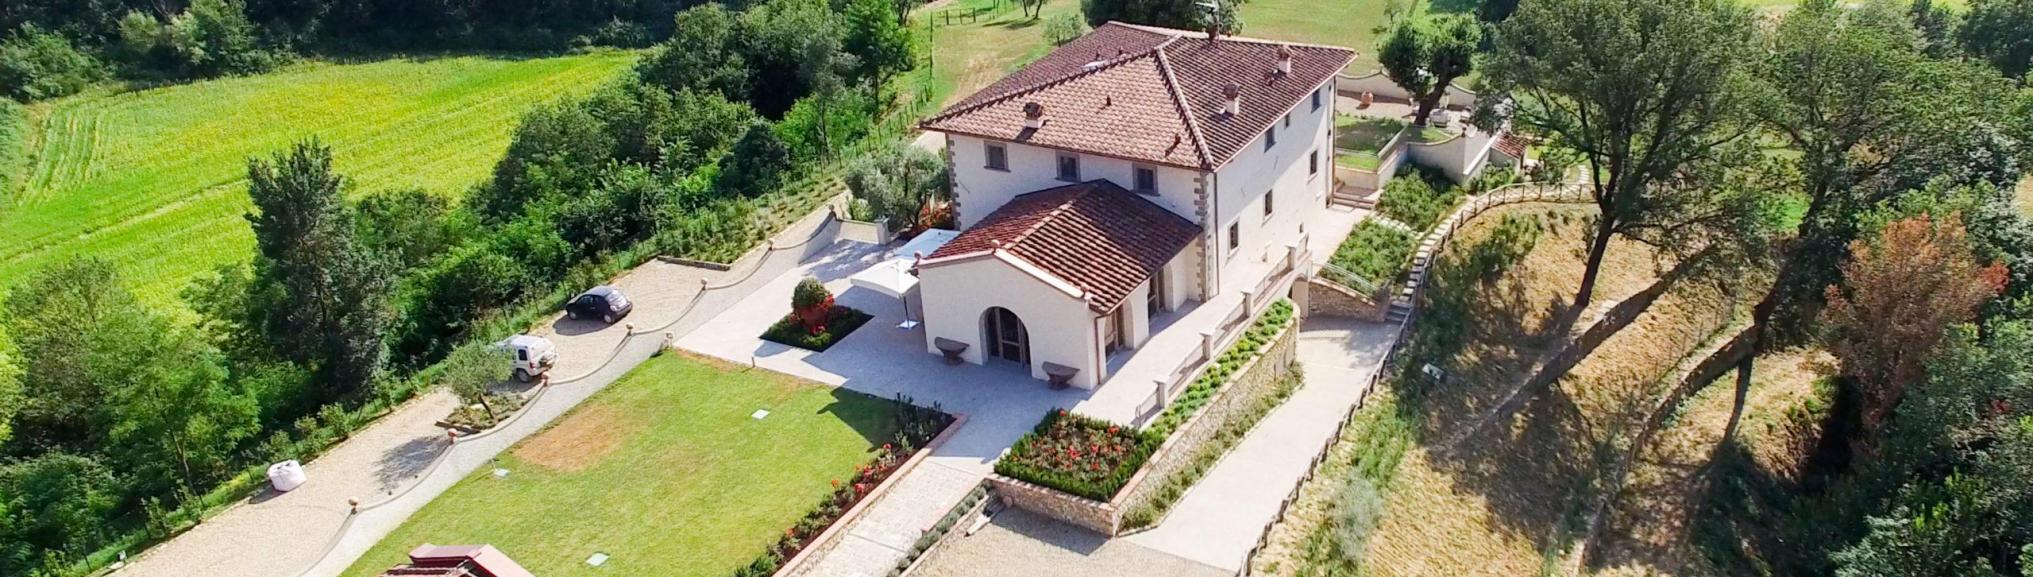 Villa Il Palagio